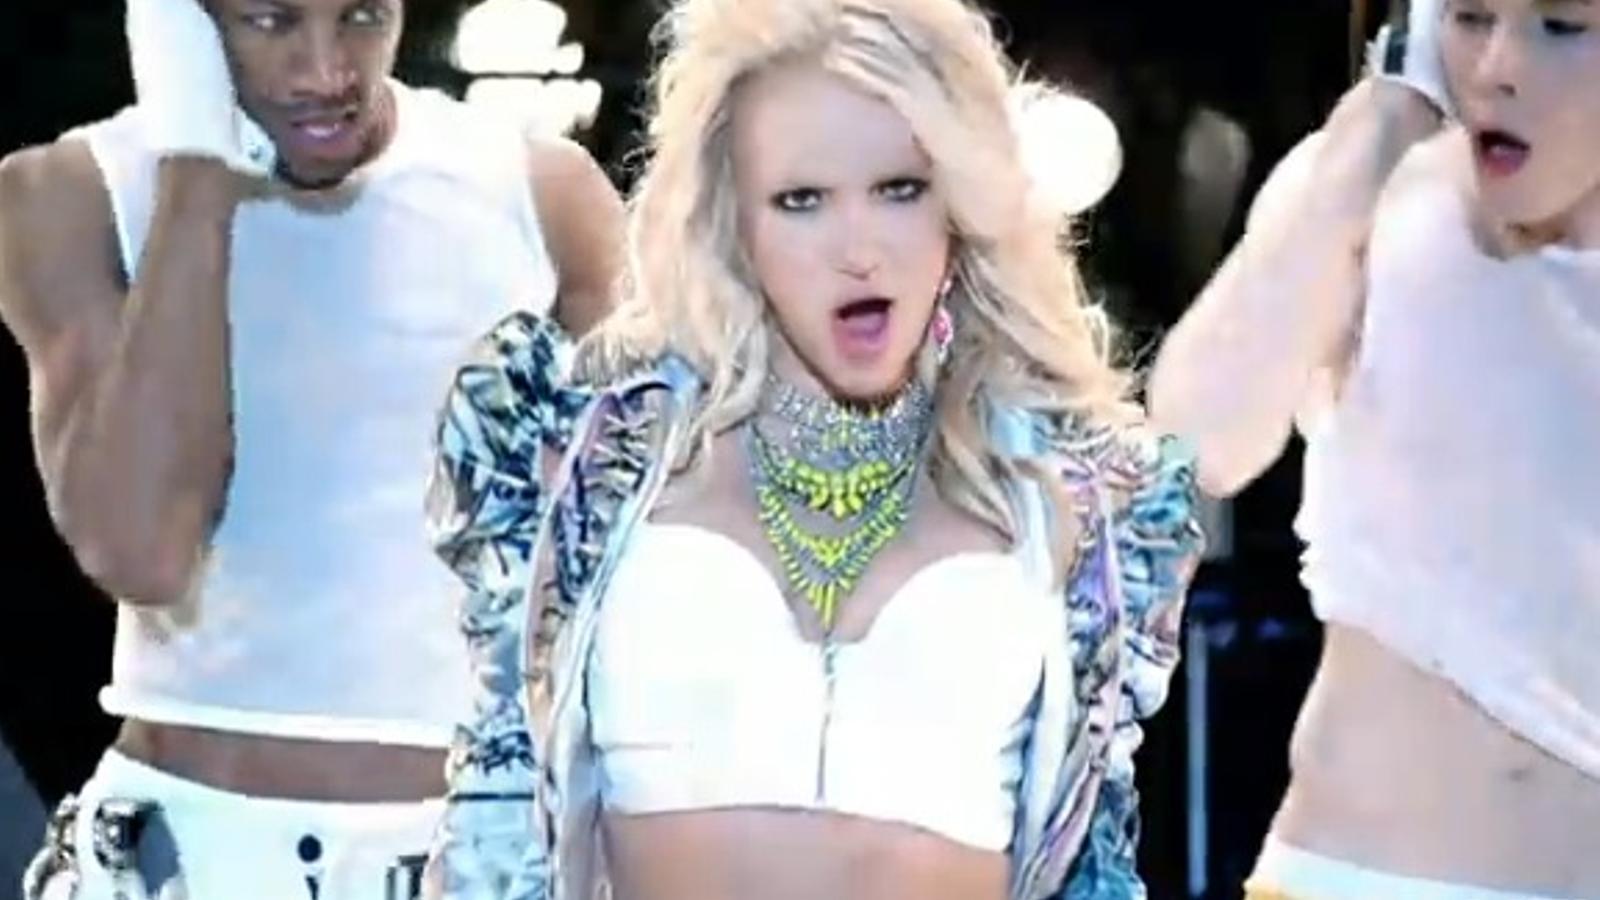 'Holding it against me', nou vídeo de Britney Spears